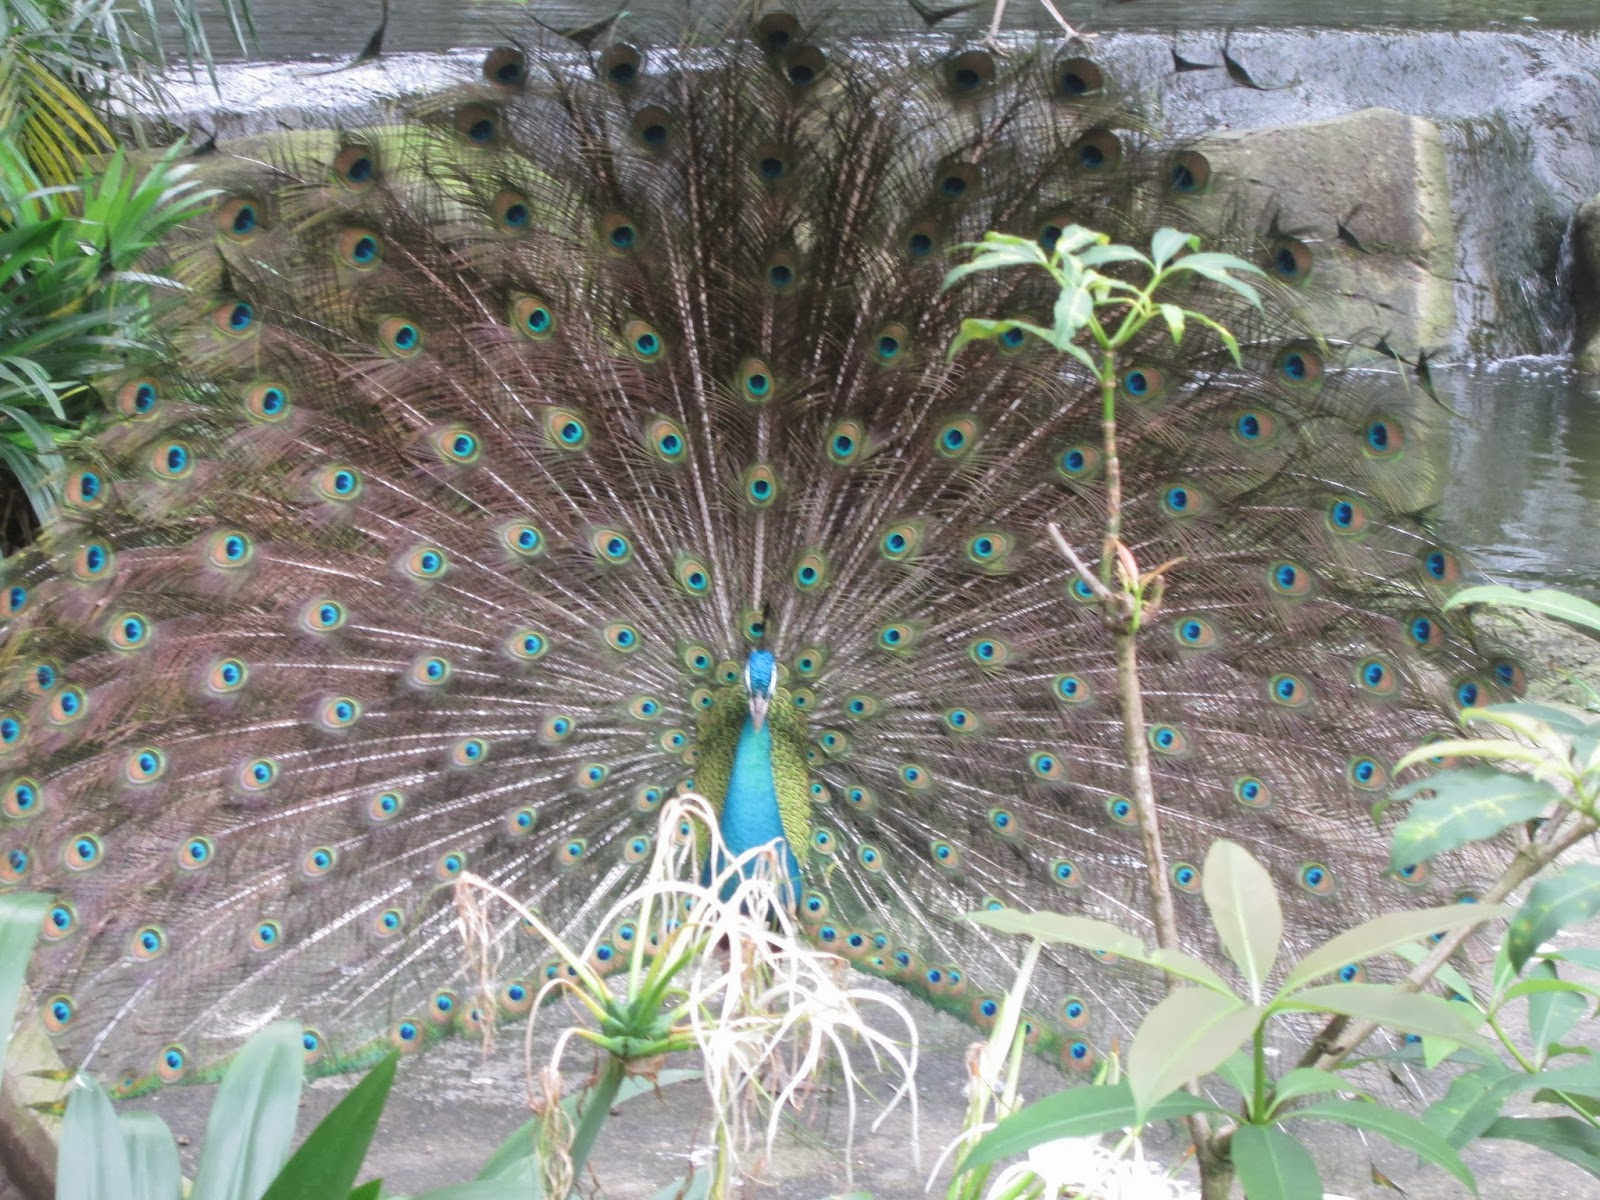 Keindahan Ciptaan Allah, WORDLESS OF WEDNESDAY, Merak, Burung Merak, Indahnya ciptaan Allah, Makhluk Allah, http://ieta-myblog.blogspot.com/2014/01/merak.html